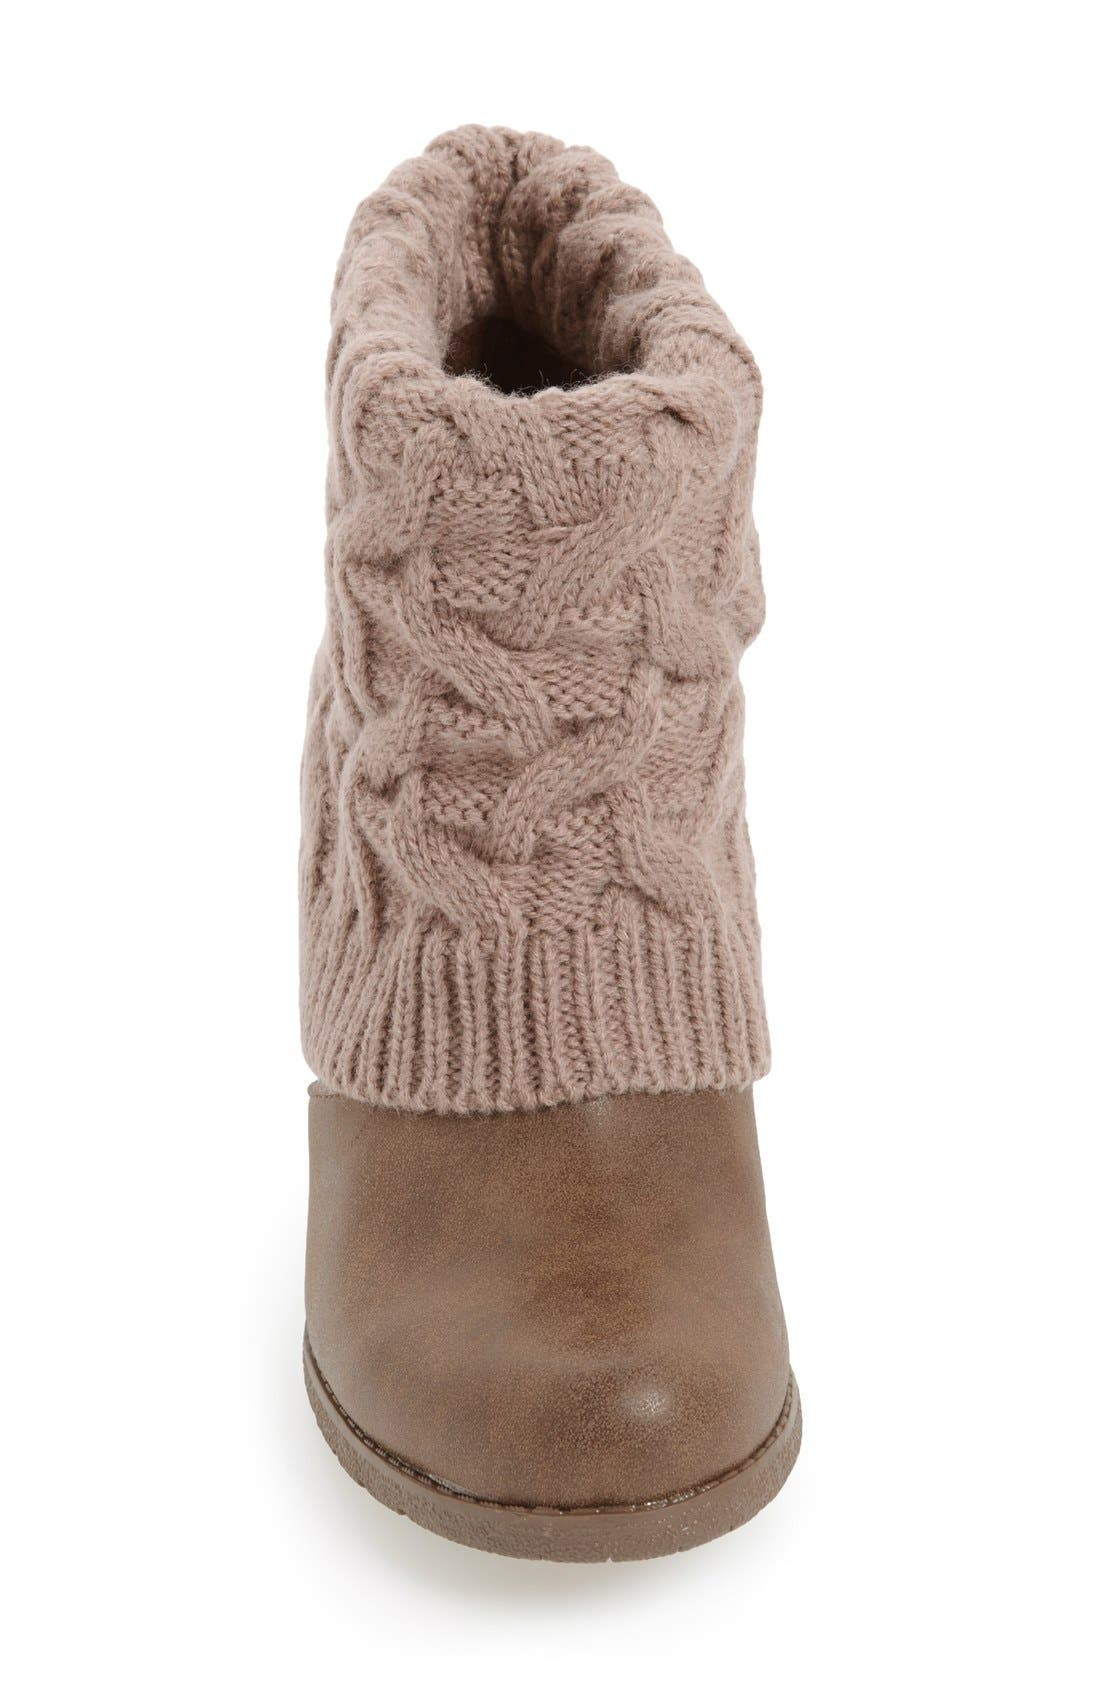 Alternate Image 2  - MUK LUKS 'Chris' Knit Cuff Bootie (Women)